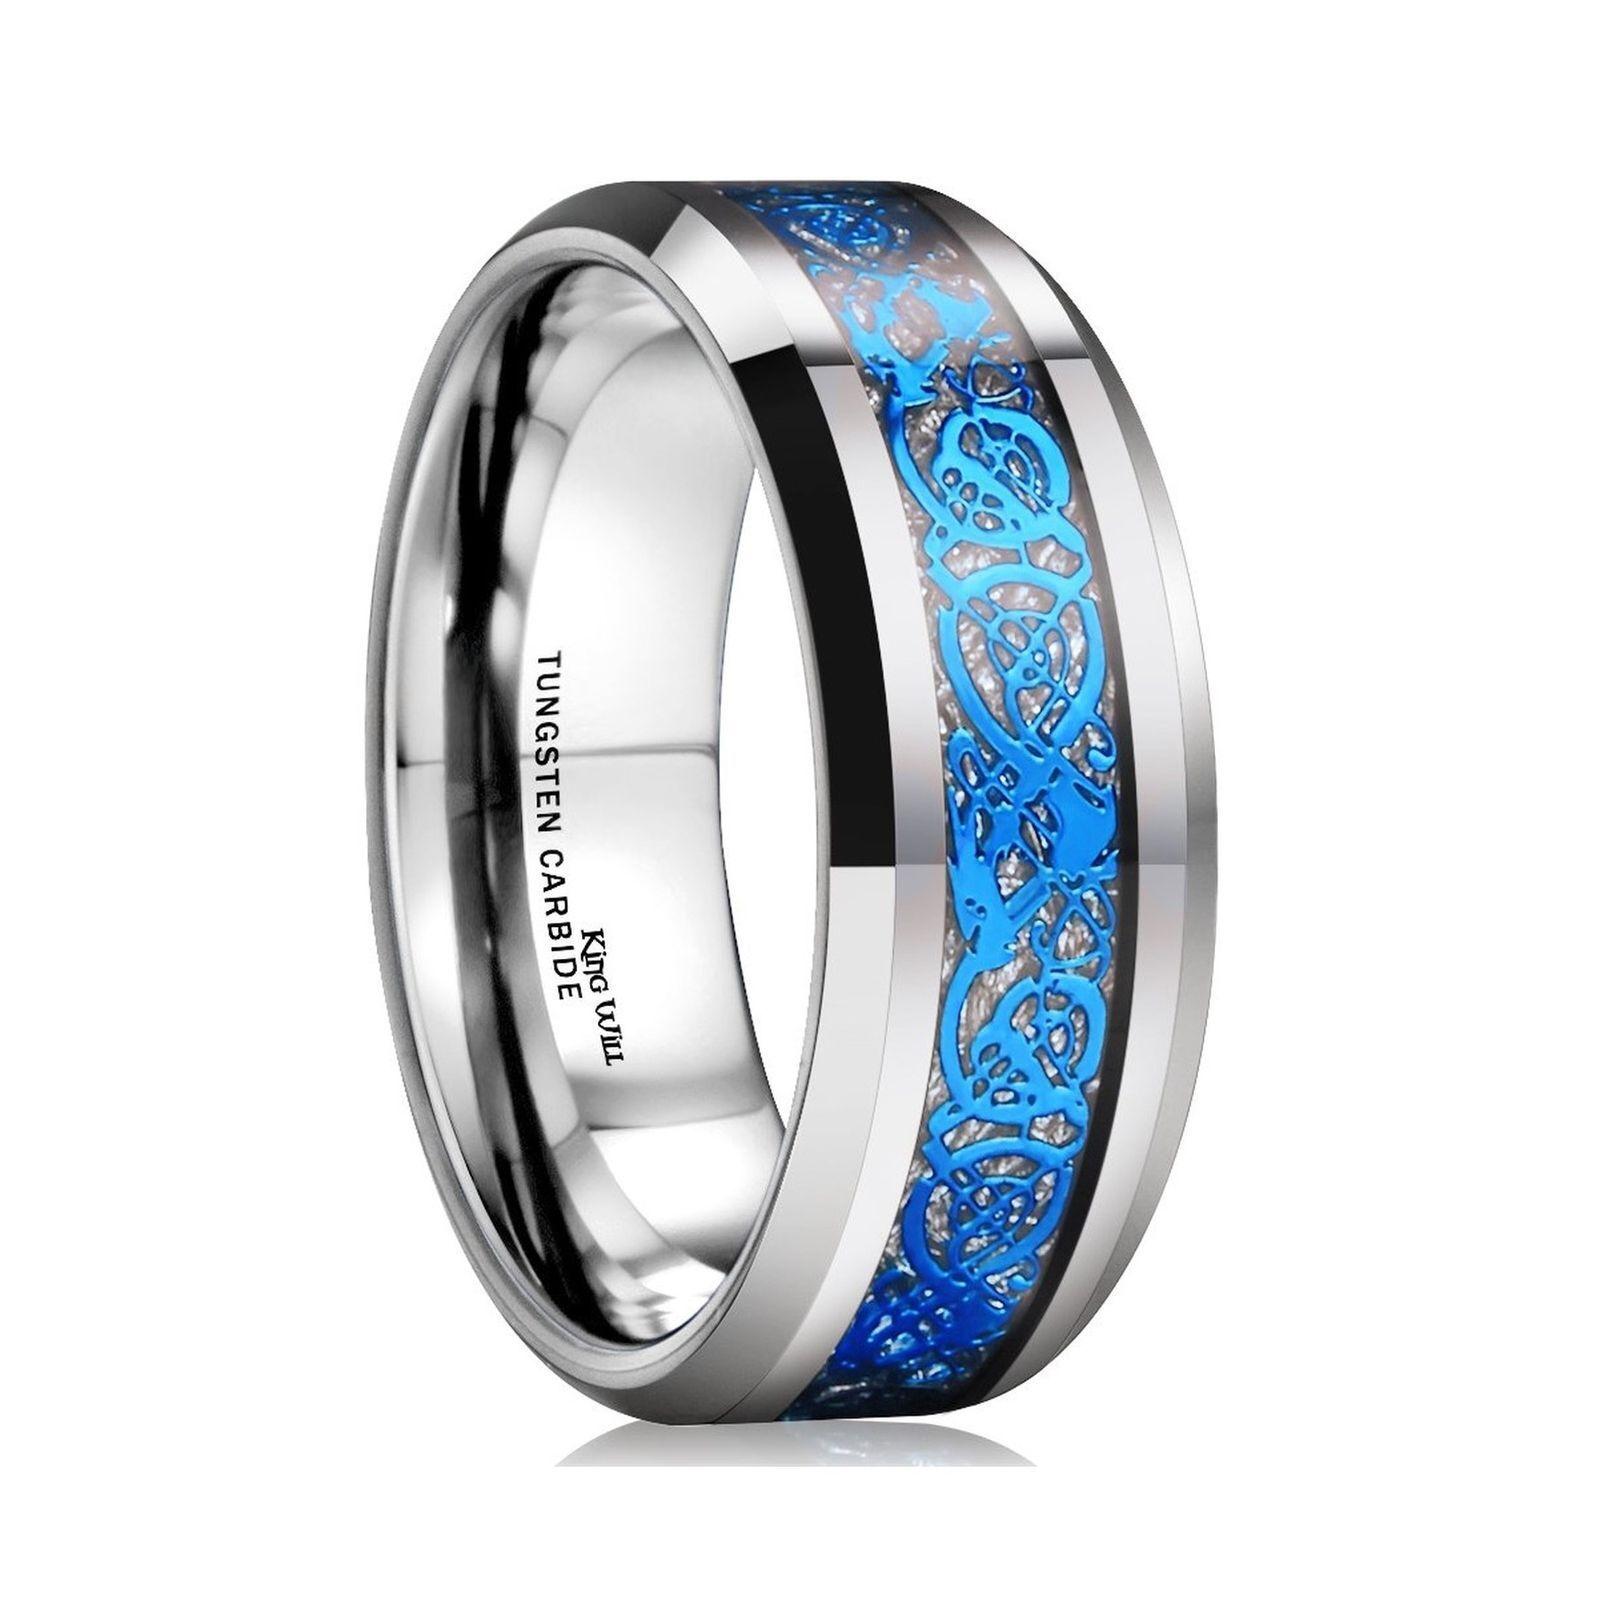 Men's Genuine Tungsten Carbide Wedding Ring bluee Celtic Imitated Meteorite Inlay